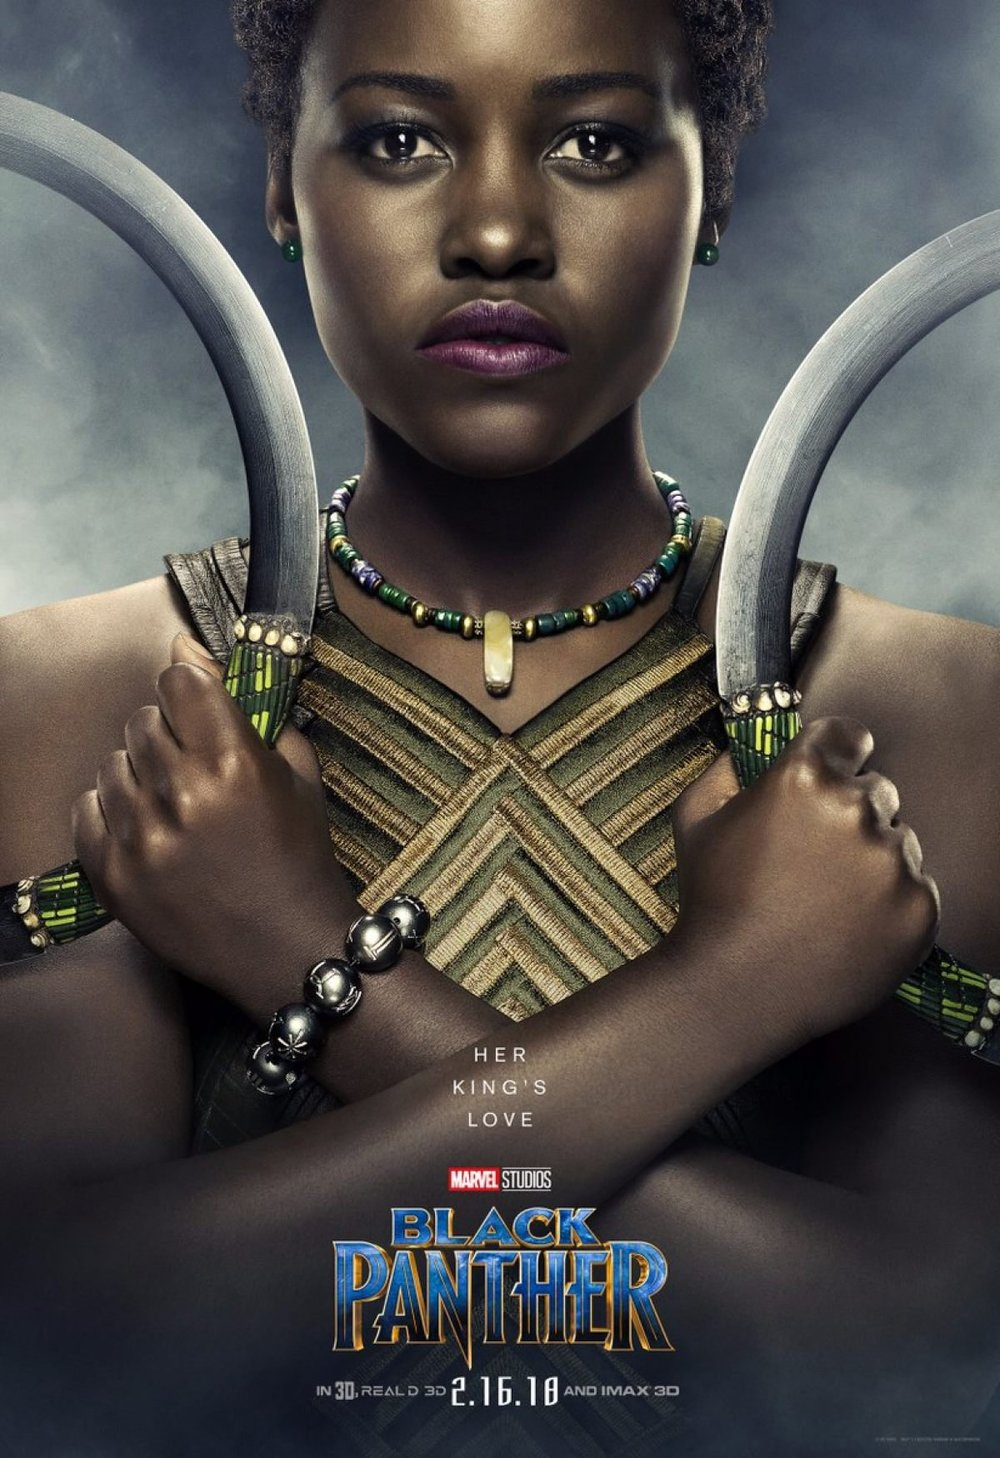 Black-Panther-Poster-3_1200_1750_81_s.jpeg